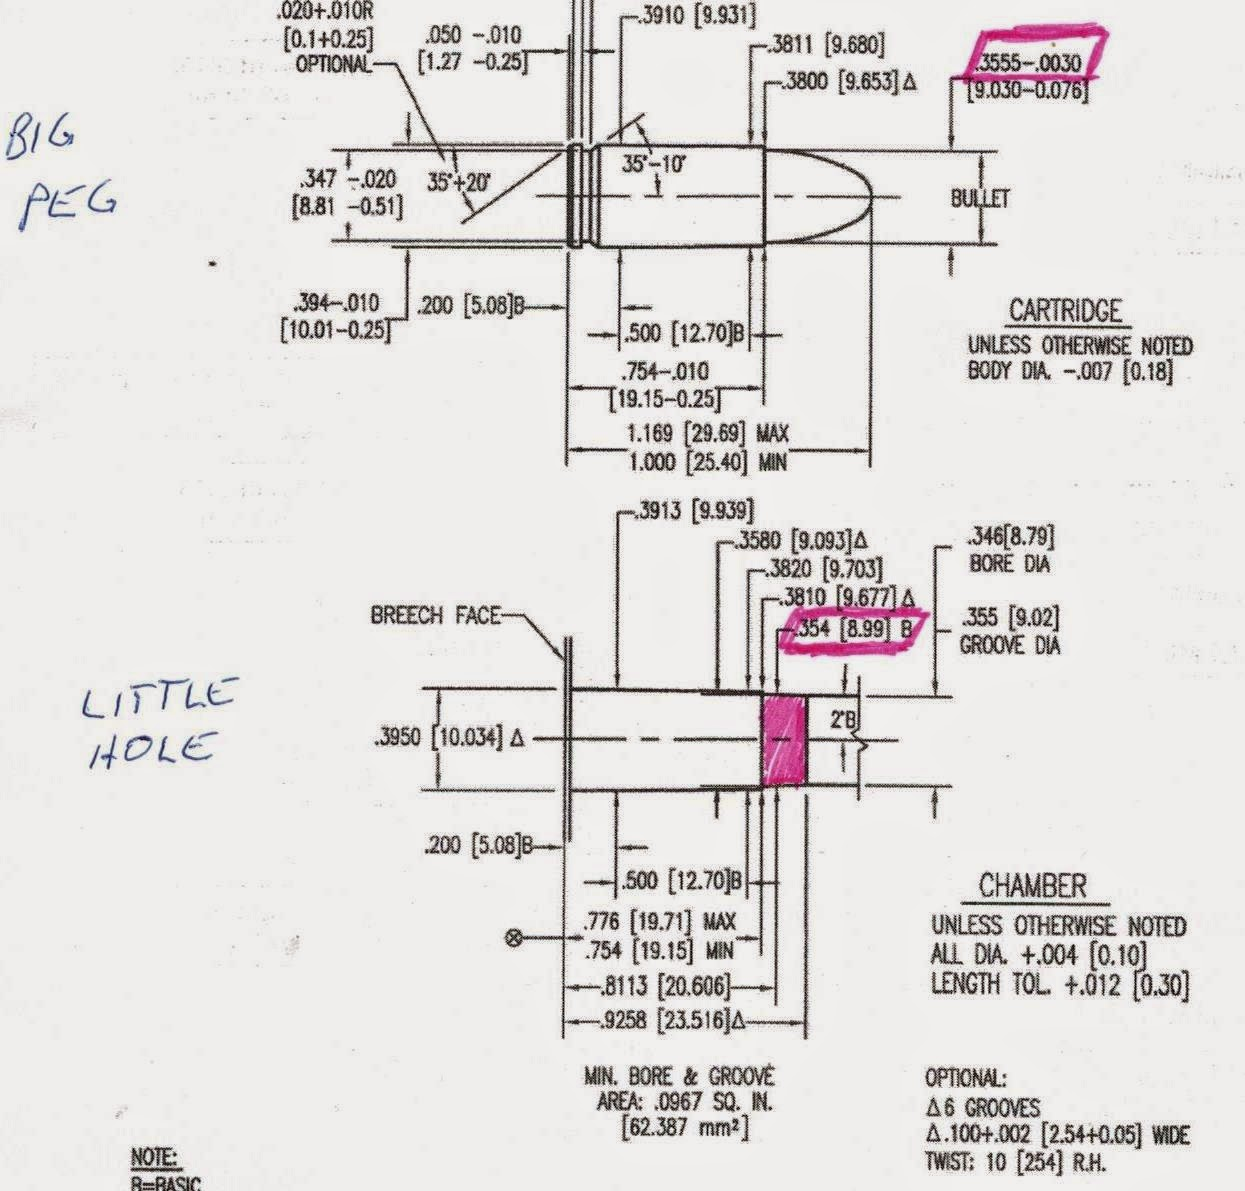 Eaton Rapids Joe: Reloading 9mm Parabellum  SAAMI mistake???